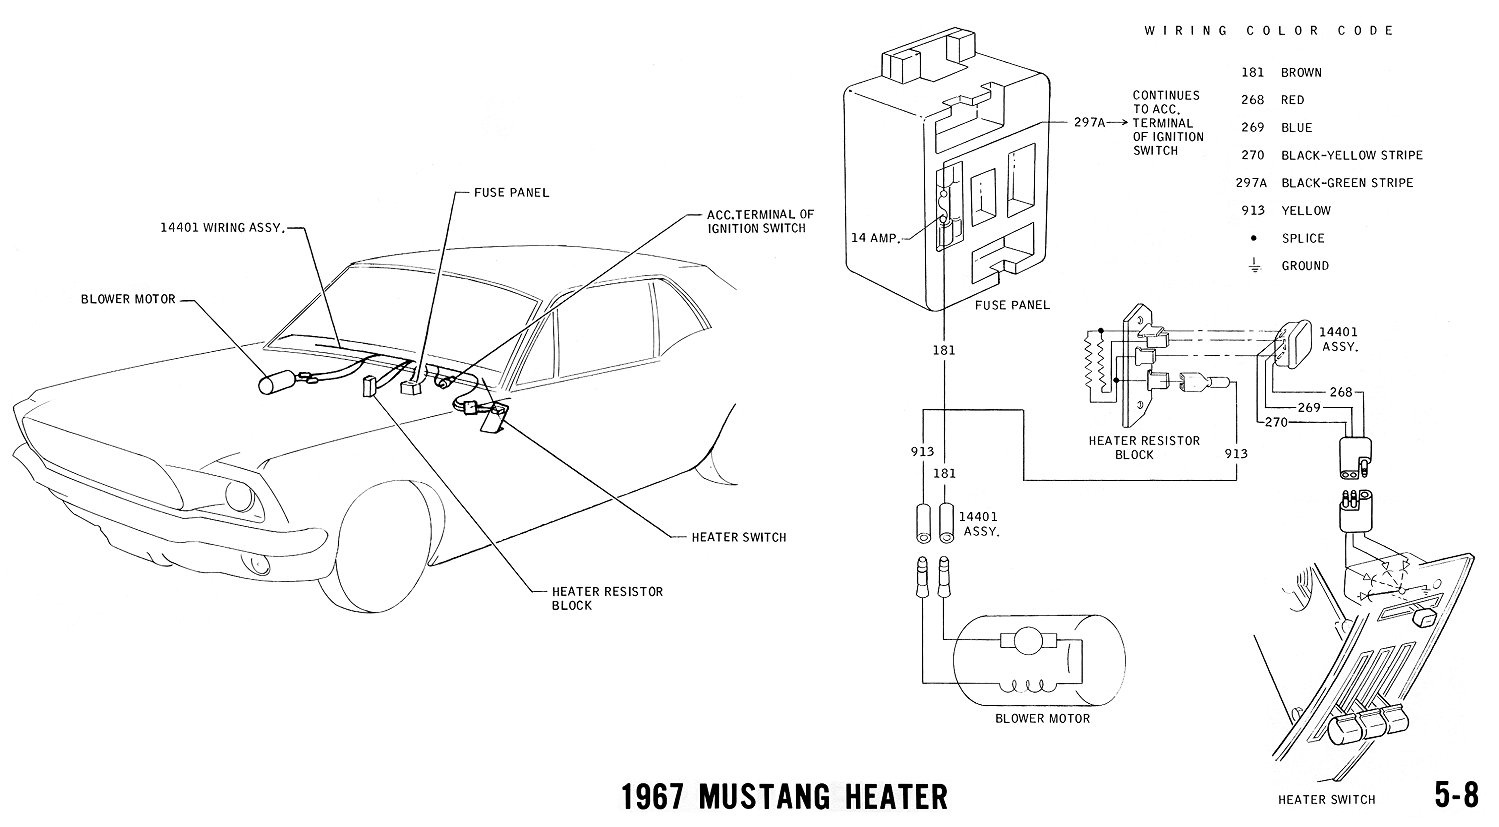 Tremendous Simple Ammeter Wiring Diagram Basic Electronics Wiring Diagram Wiring Digital Resources Instshebarightsorg